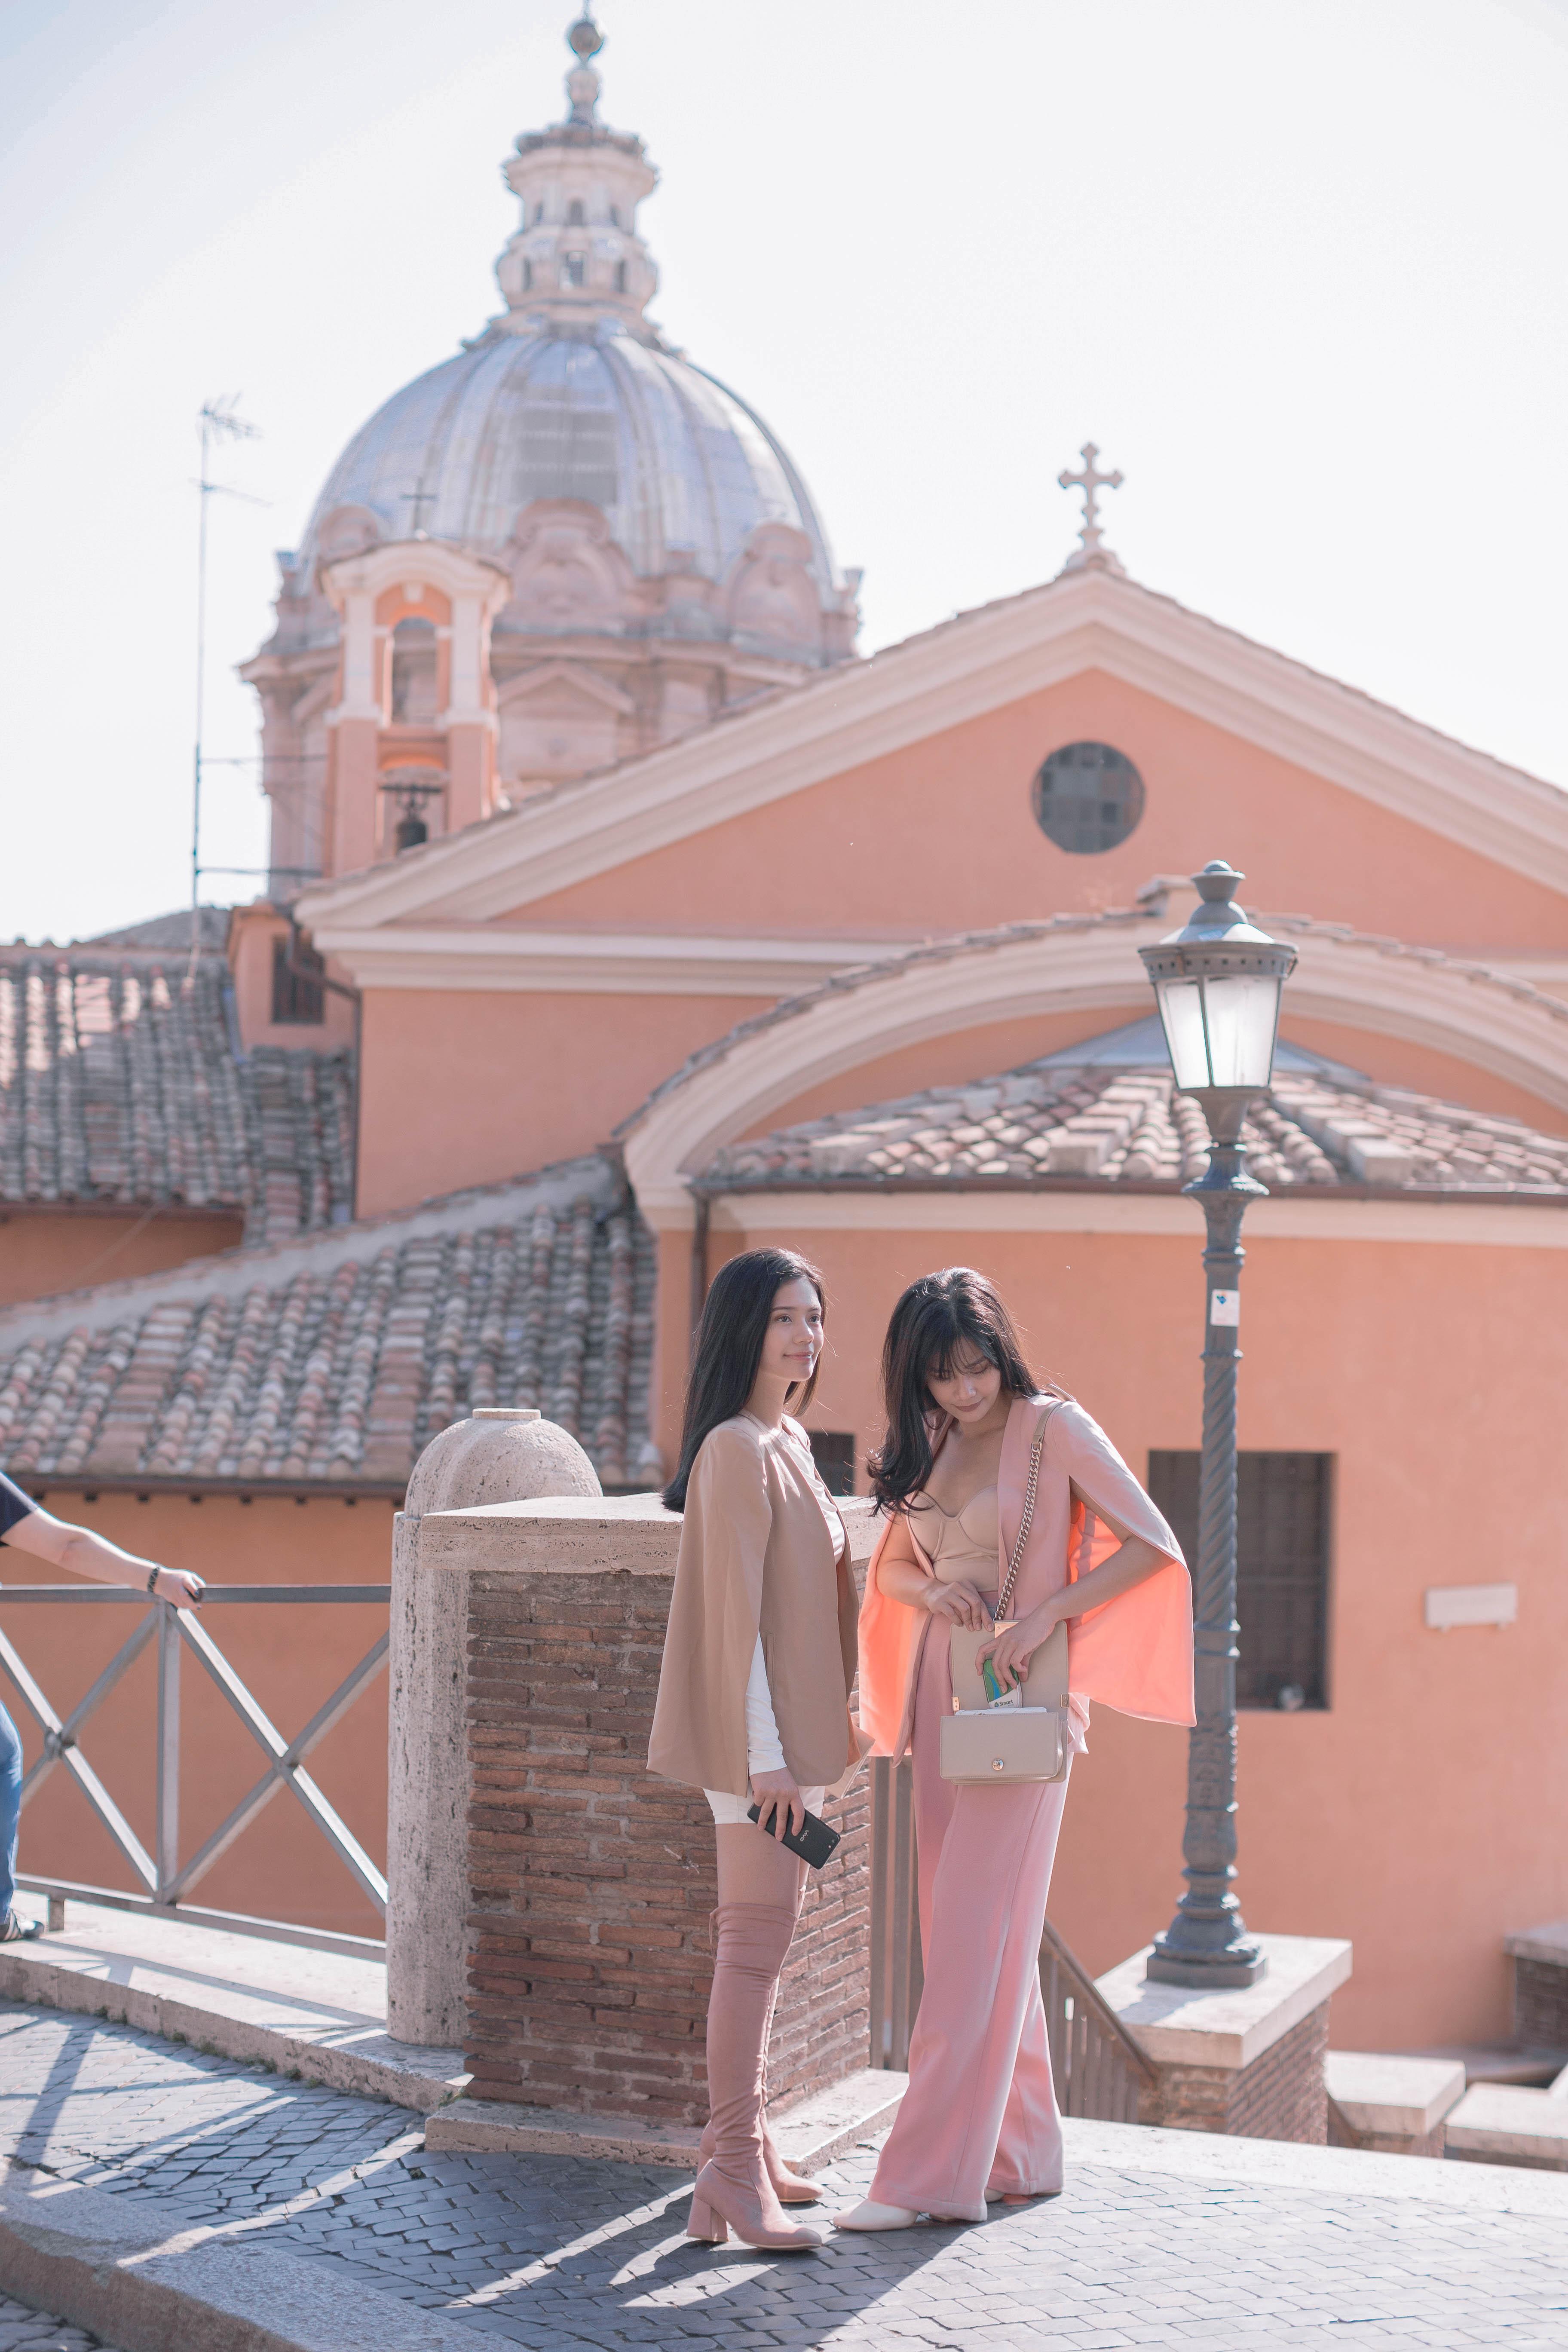 vernica_enciso-rome-s1_76 copy